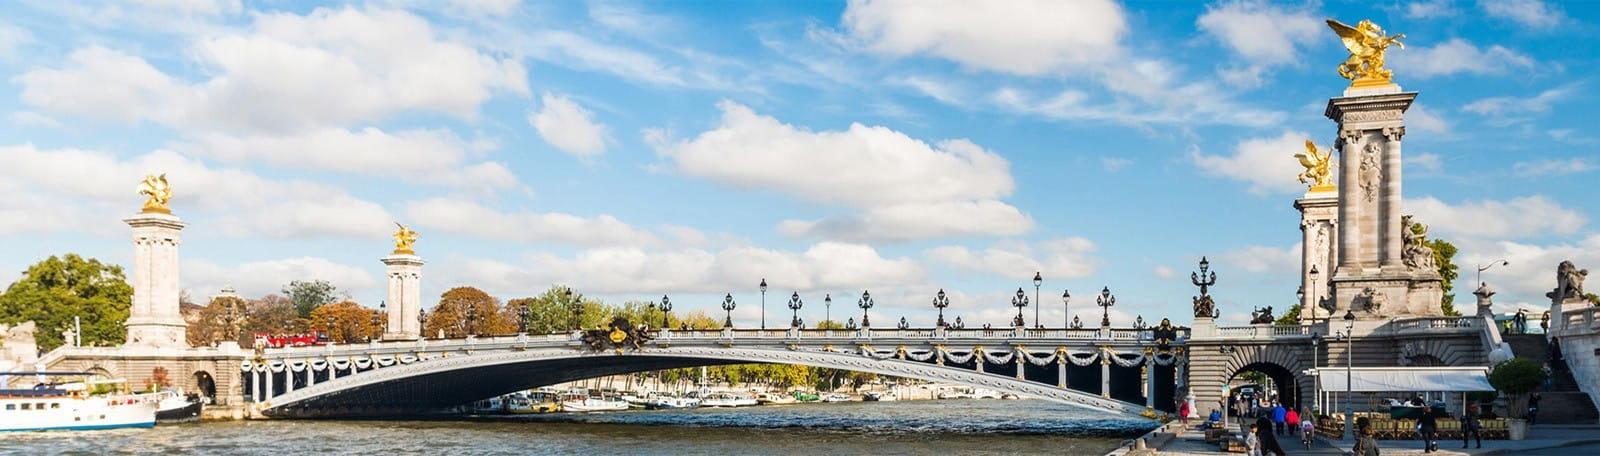 Q-Park Tour Maubourg